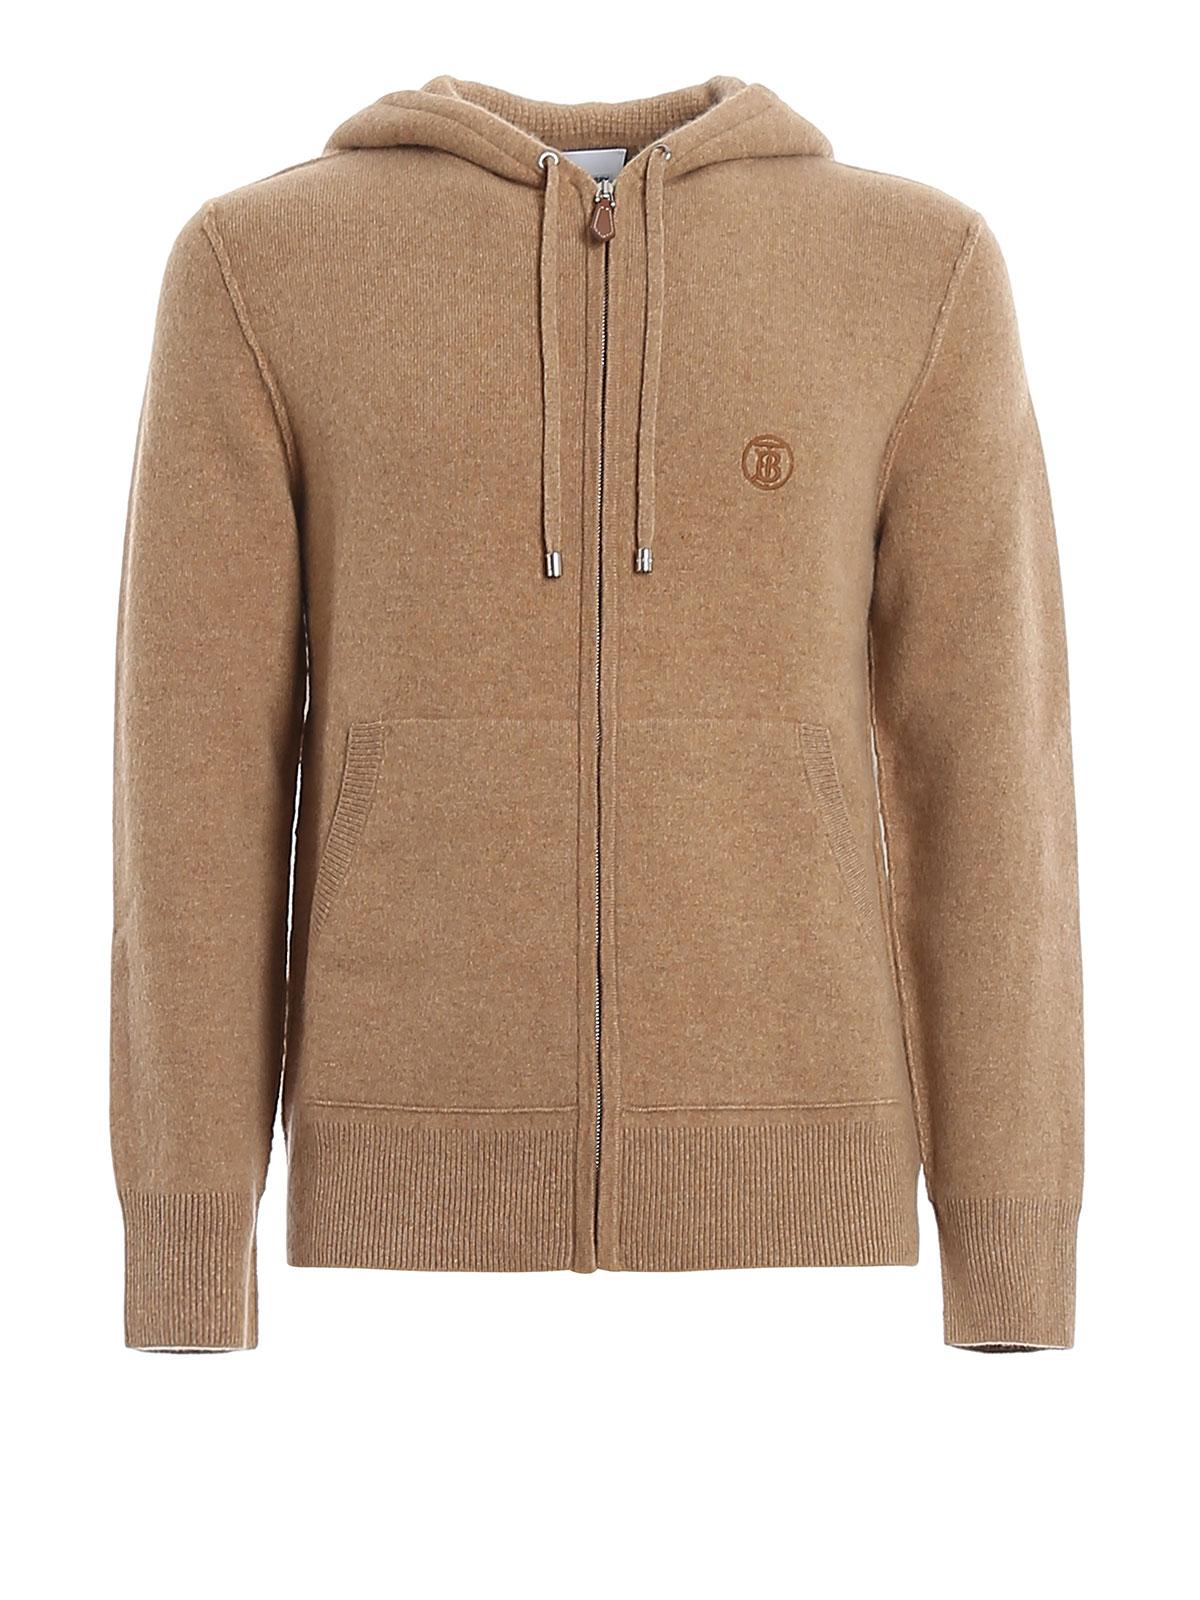 Burberry Monogram Motif Cashmere Blend Hooded Top In Neutrals